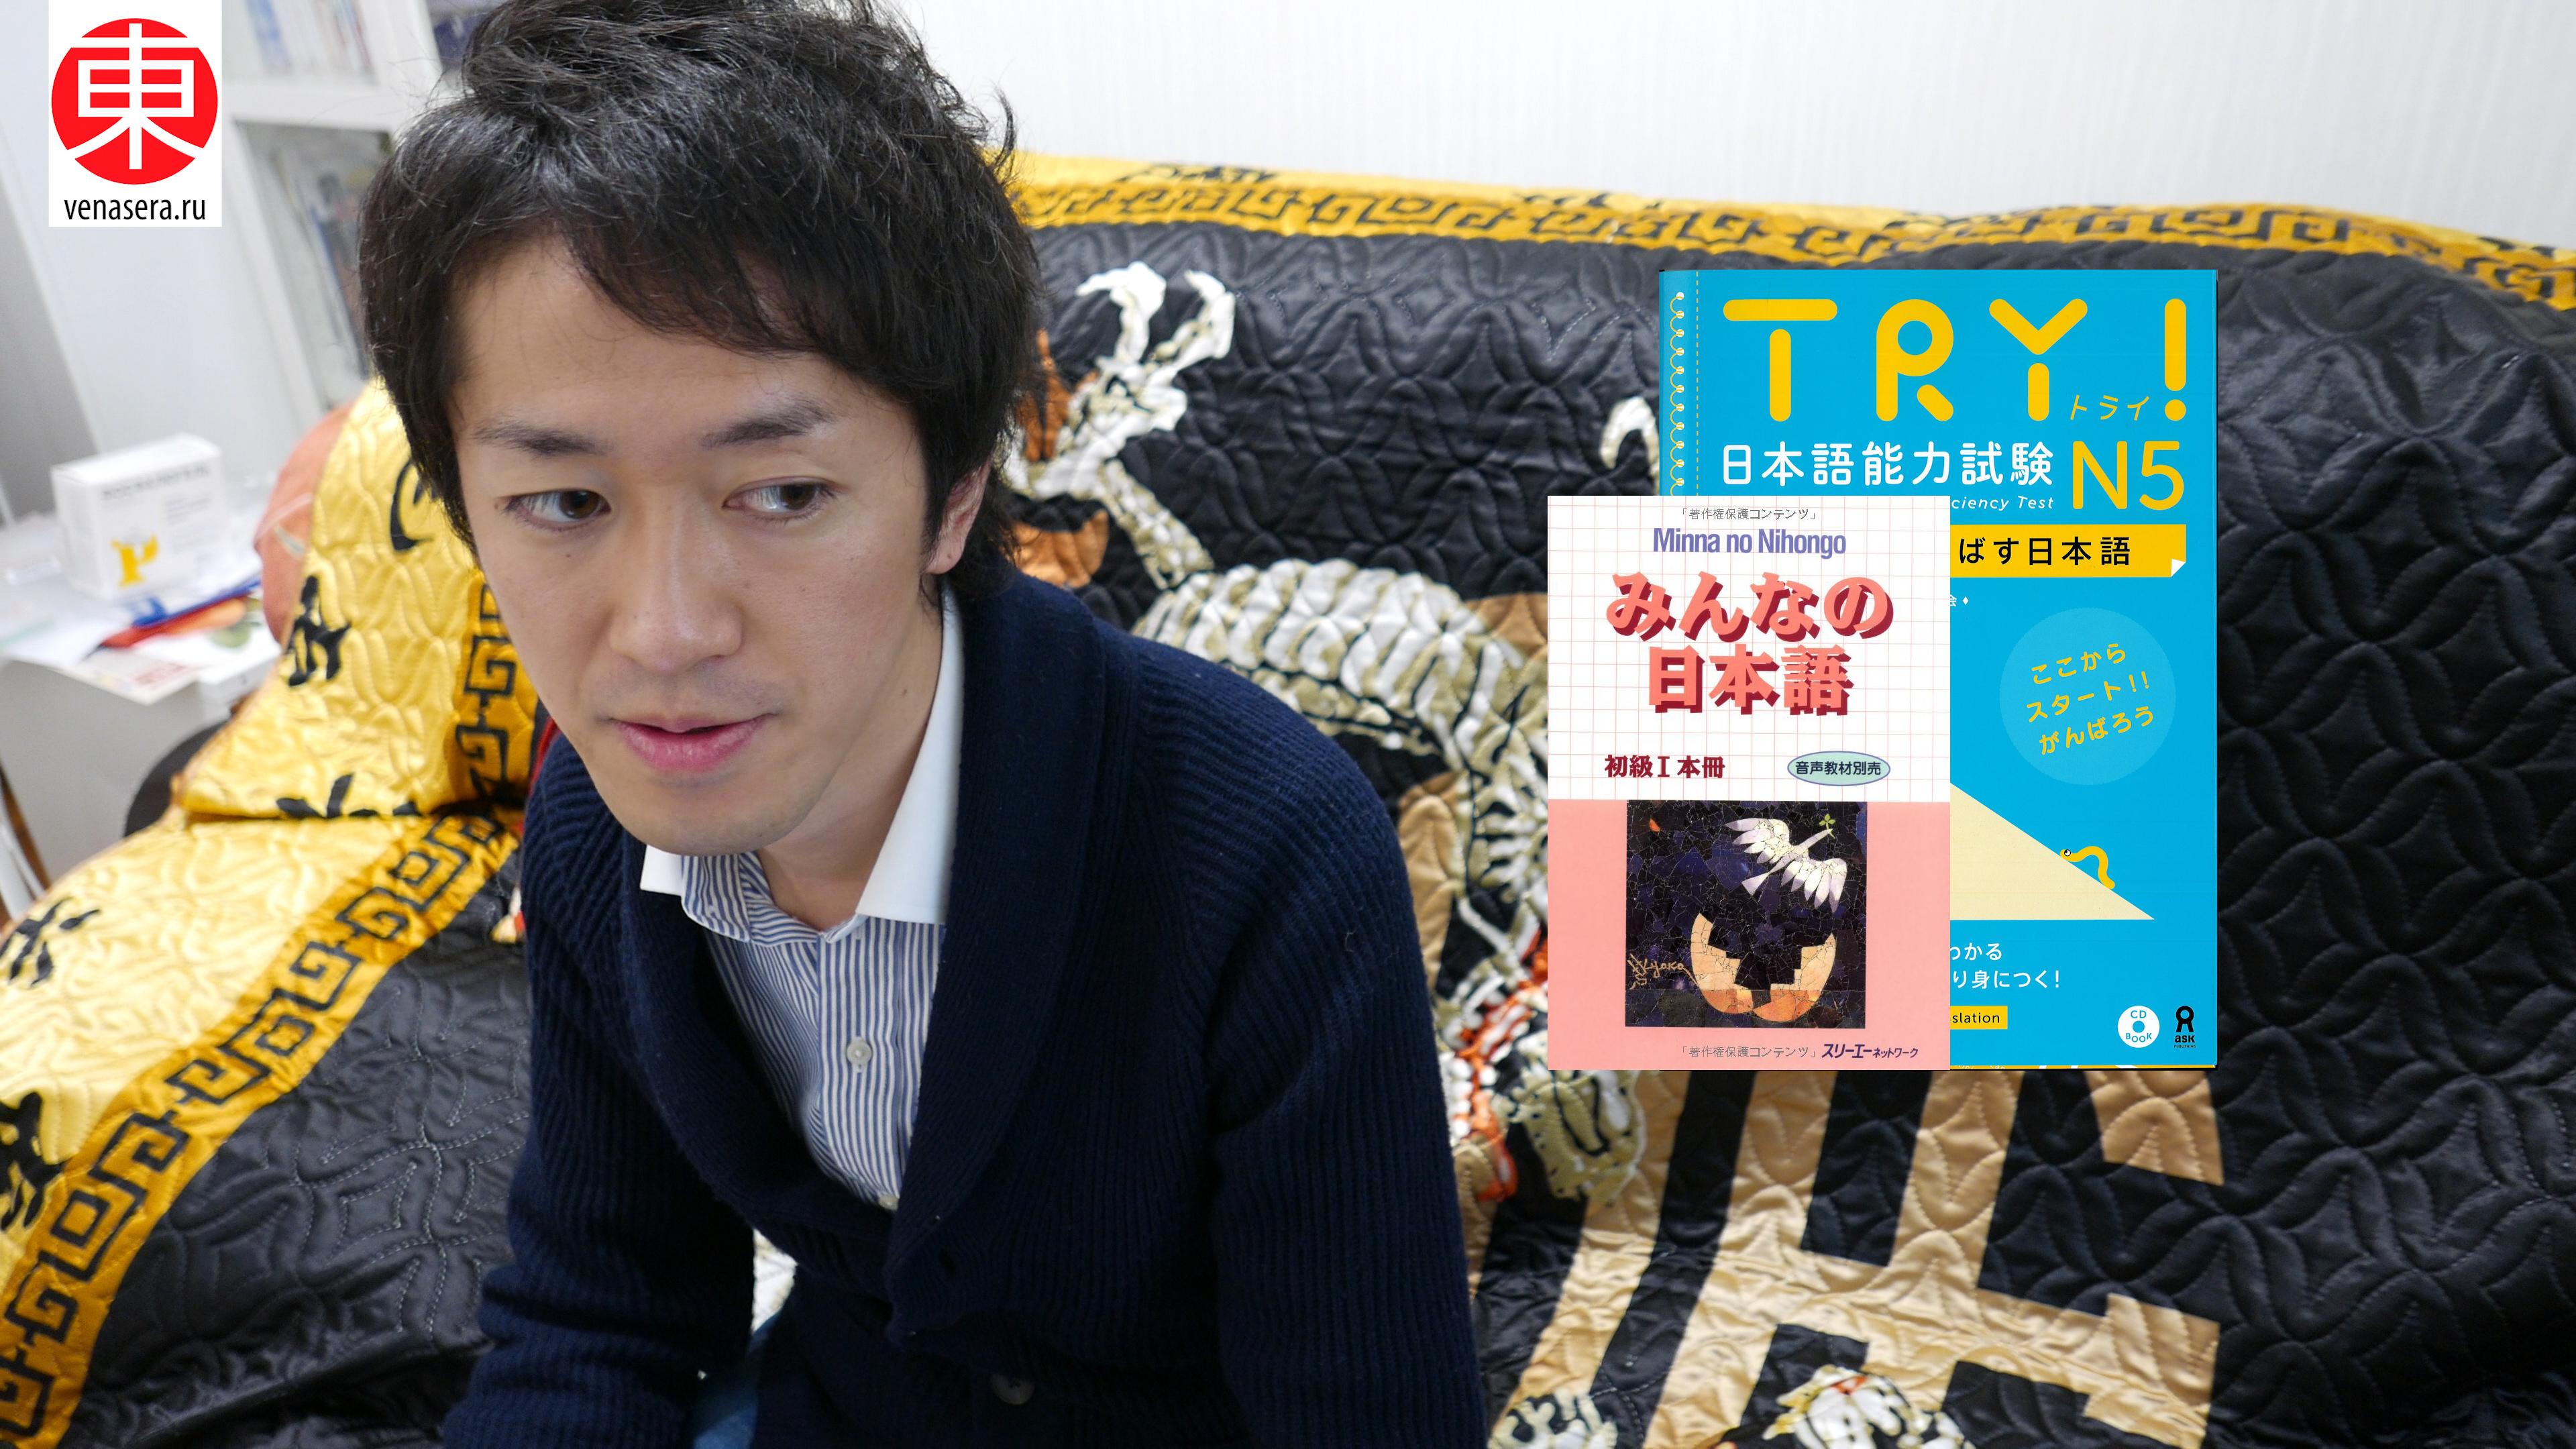 Try N5 и Minna no Nihongo